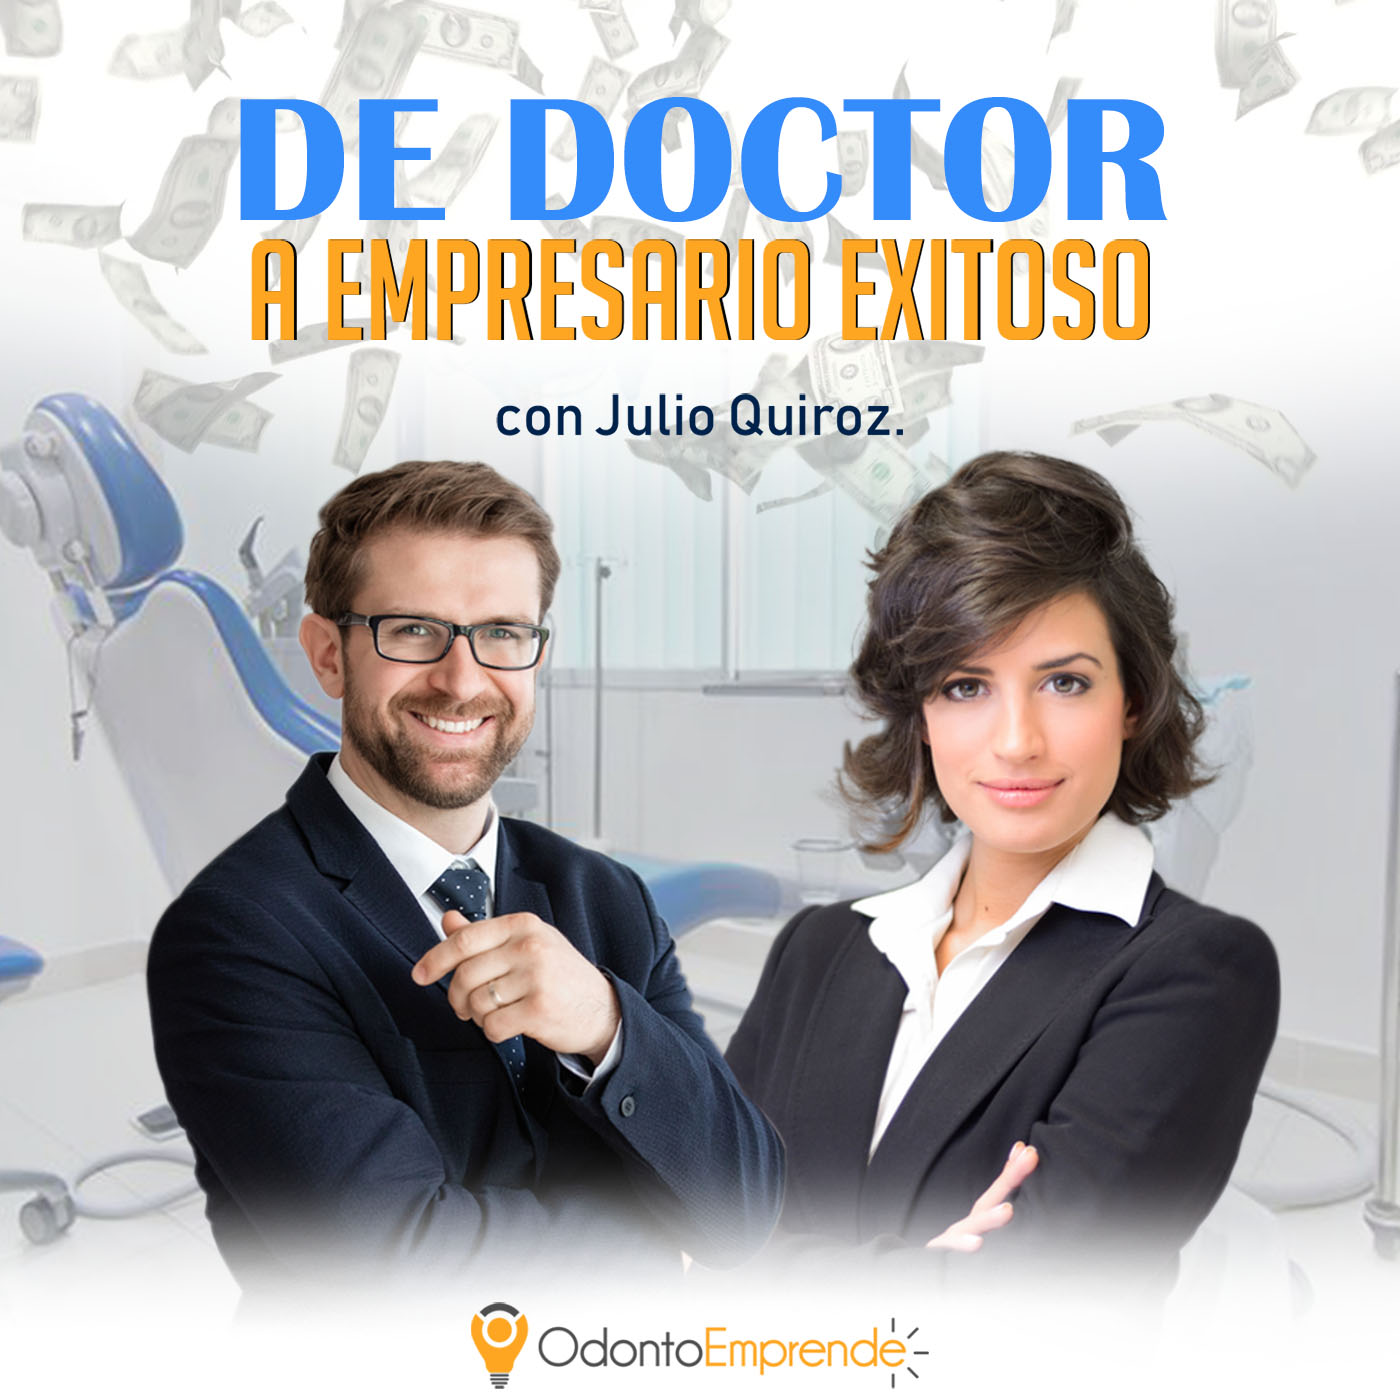 De Doctor a Empresario Exitoso con Julio Quiroz show art